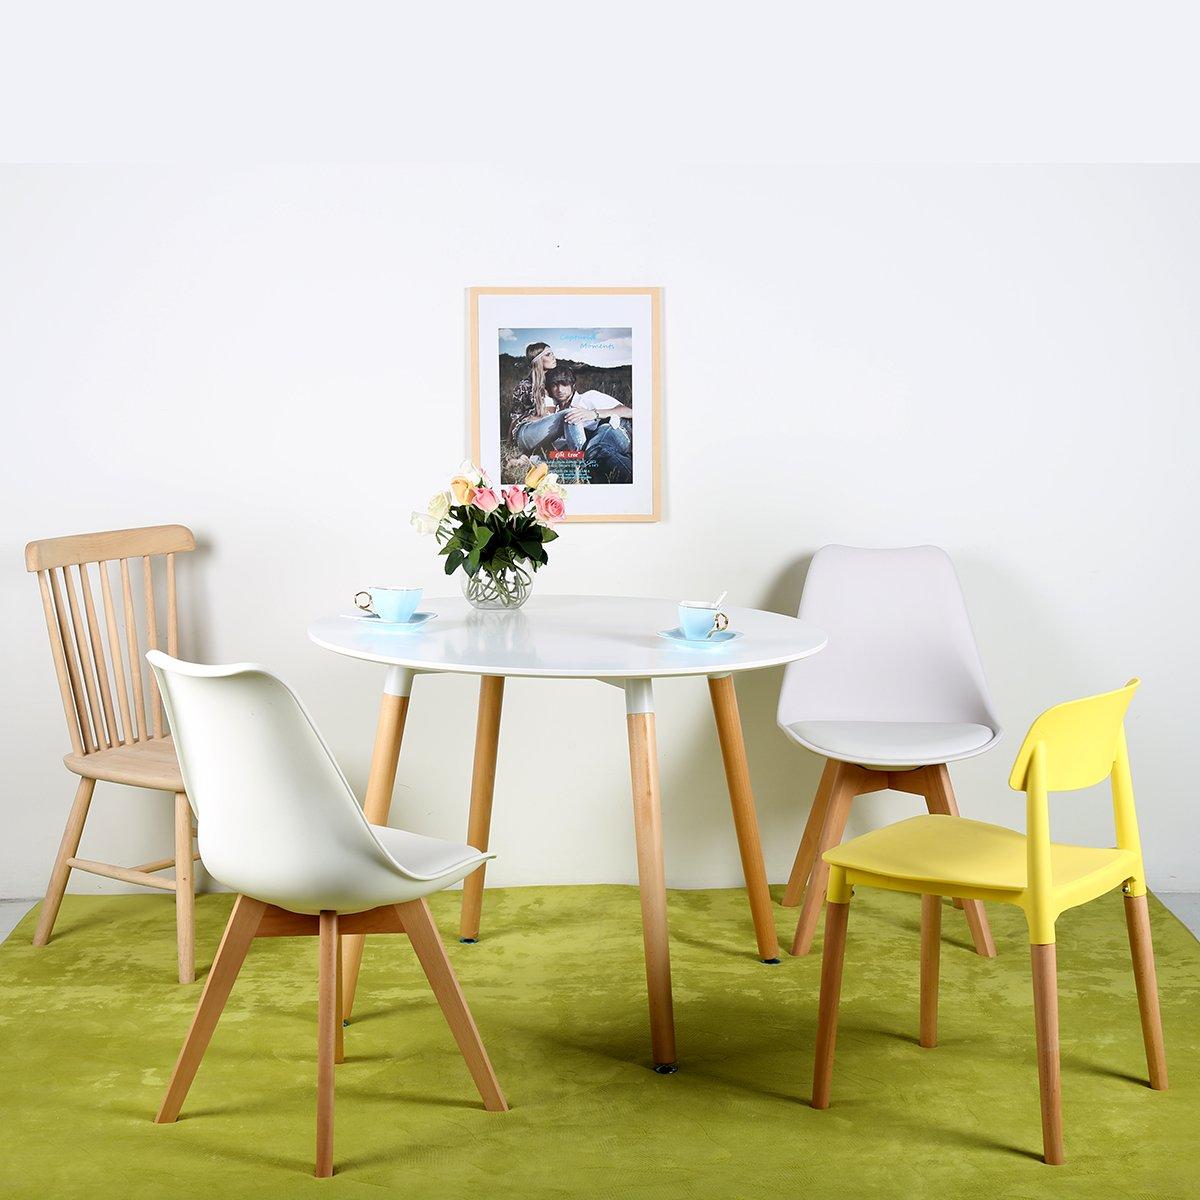 4er esszimmerst hle mit massivholz buche bein retro design gepolsterter stuhle ebay - Stuhle retro design ...